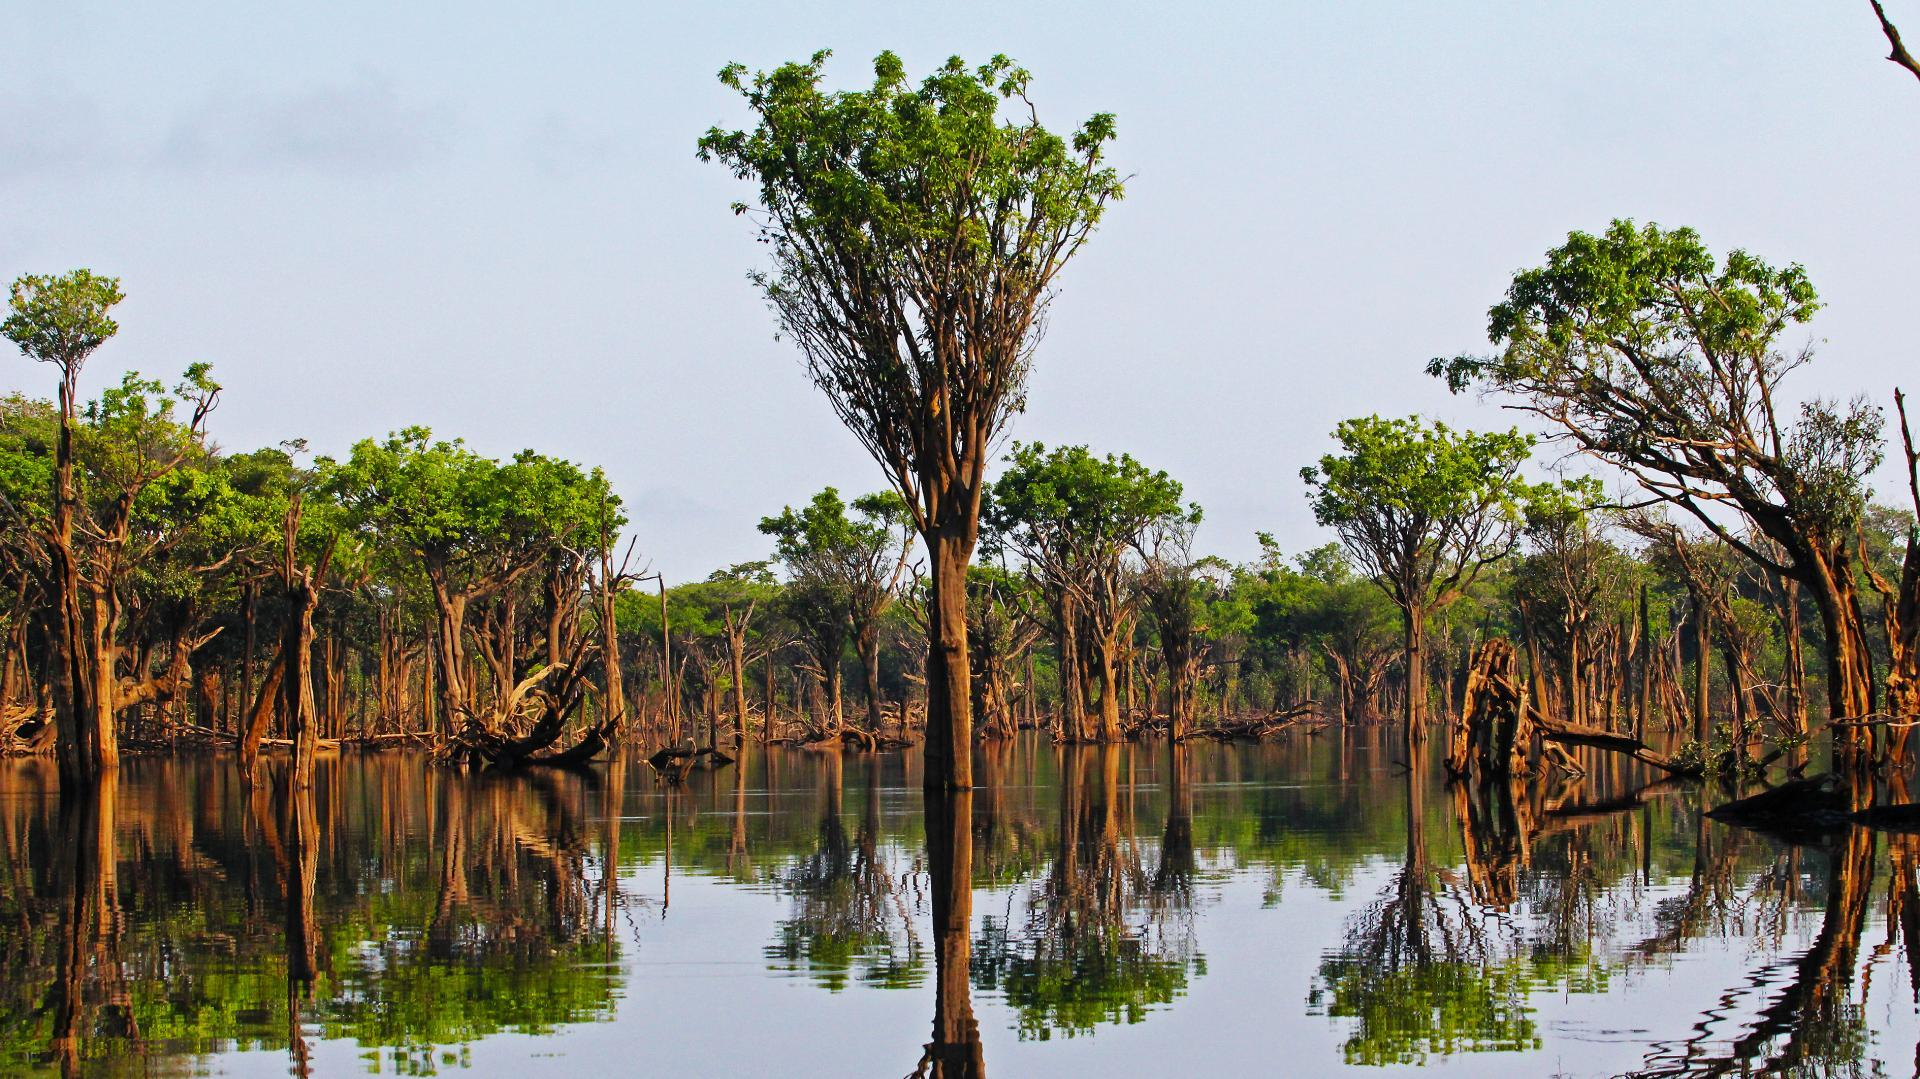 Landscape in the Amazon Rainforest